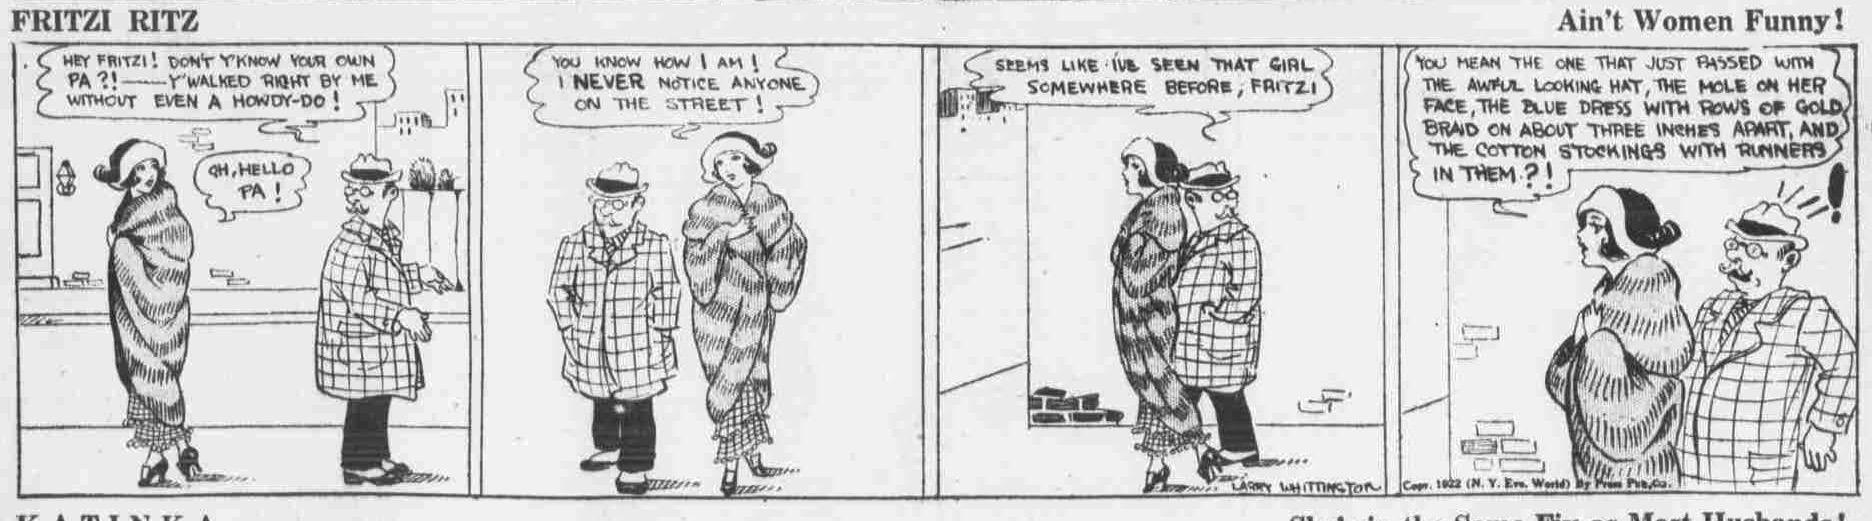 Nov. 21, 1922